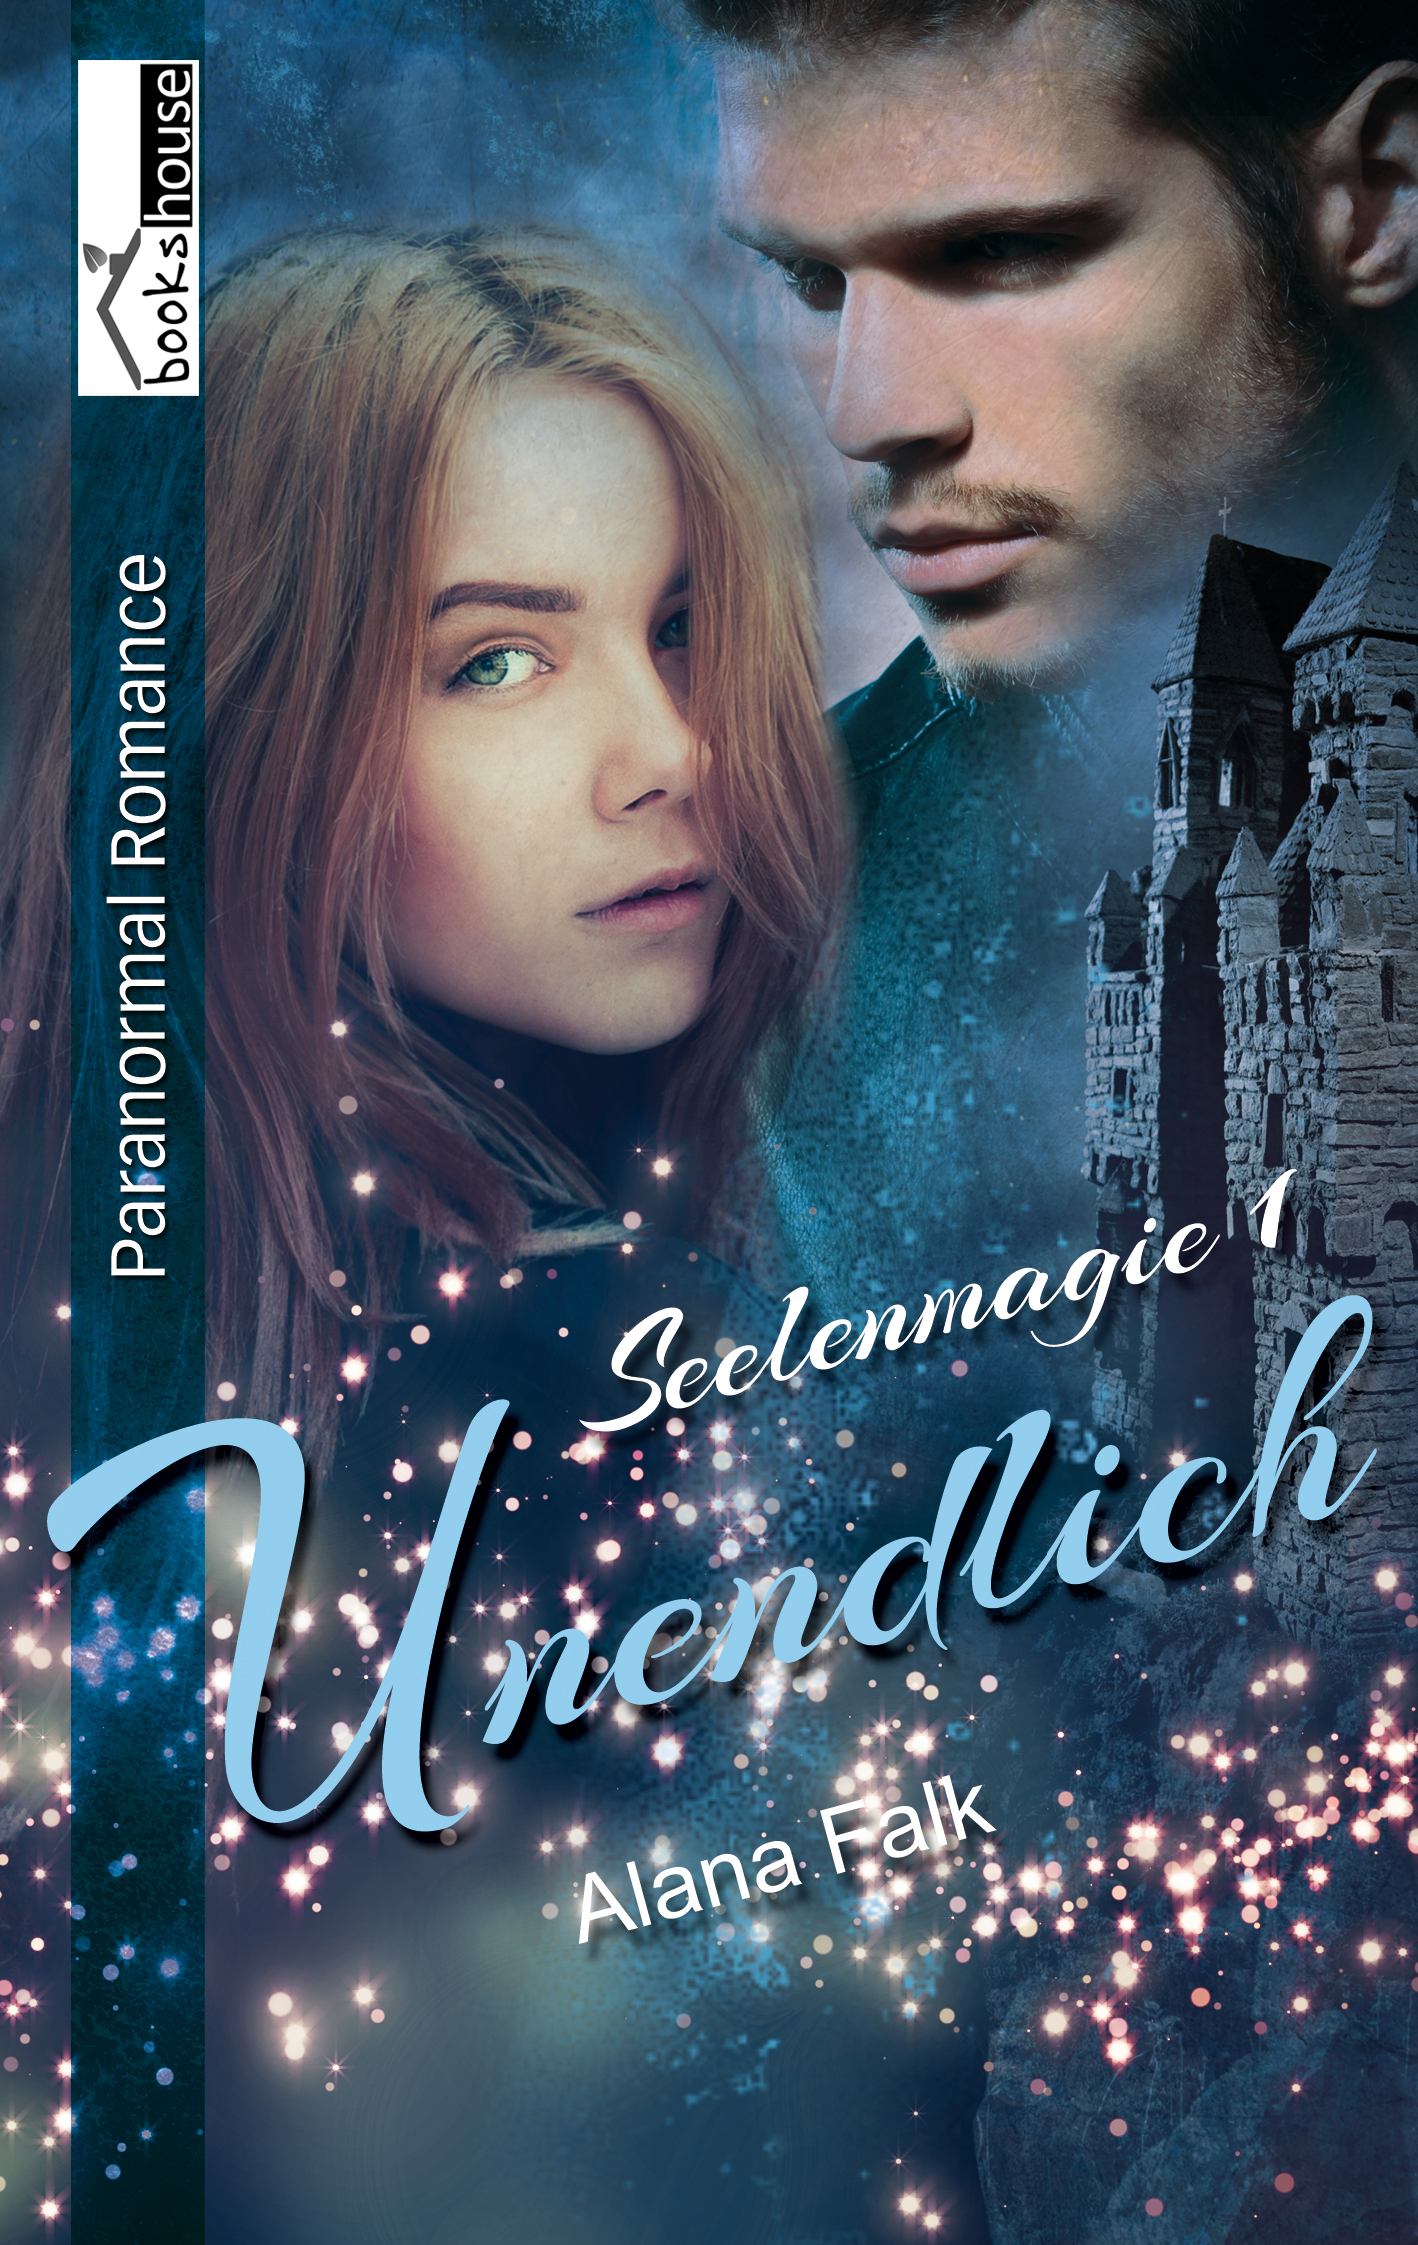 Seelenmagie: Band 1 - Unendlich - Alana Falk